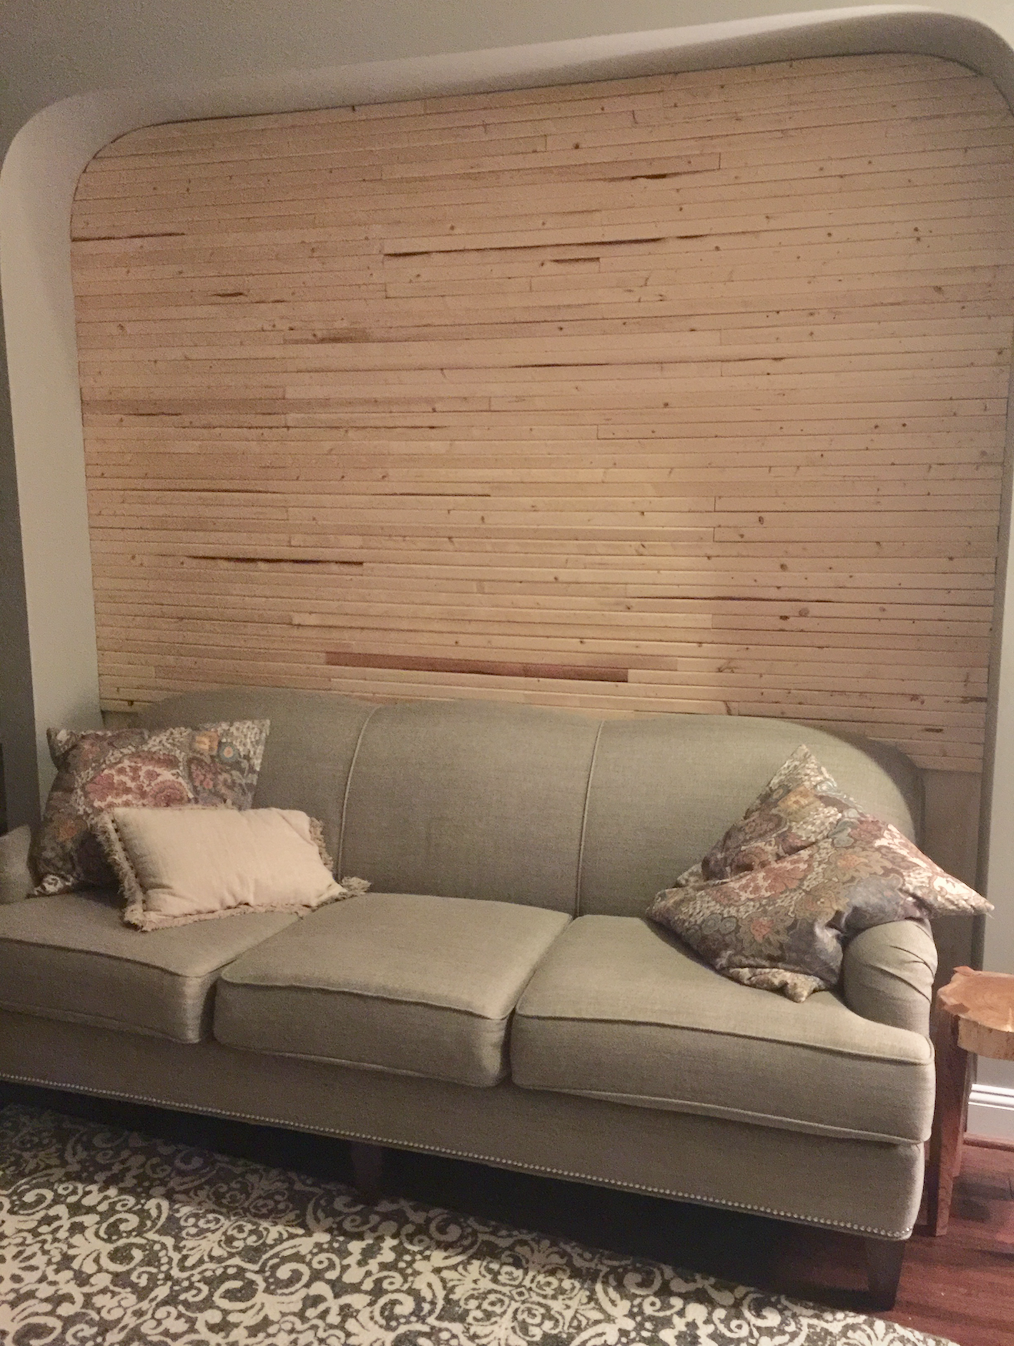 Raw wood wall